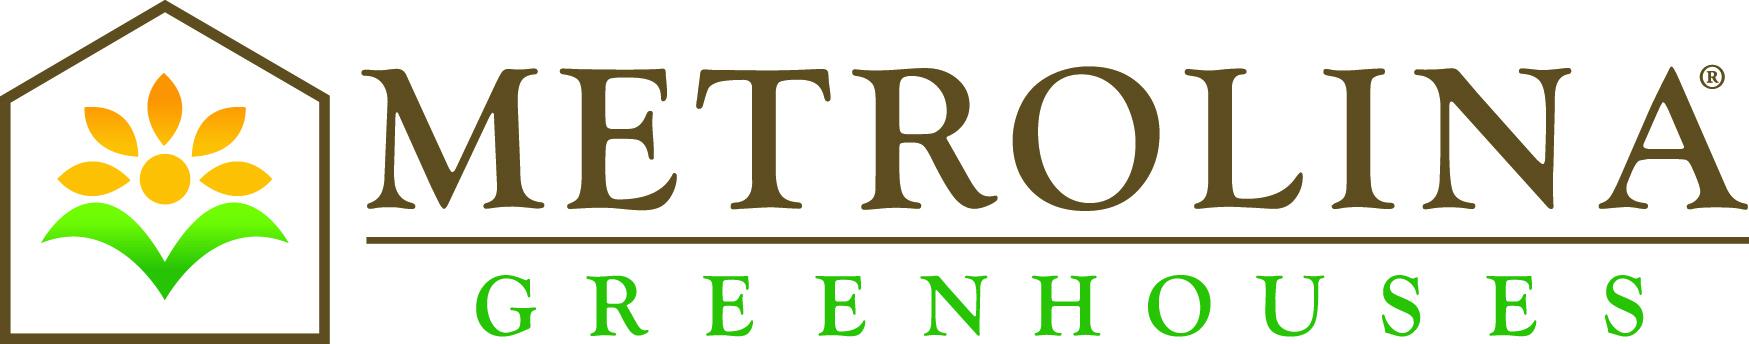 The Bristish Open - Metrolina Greenhouses - Logo